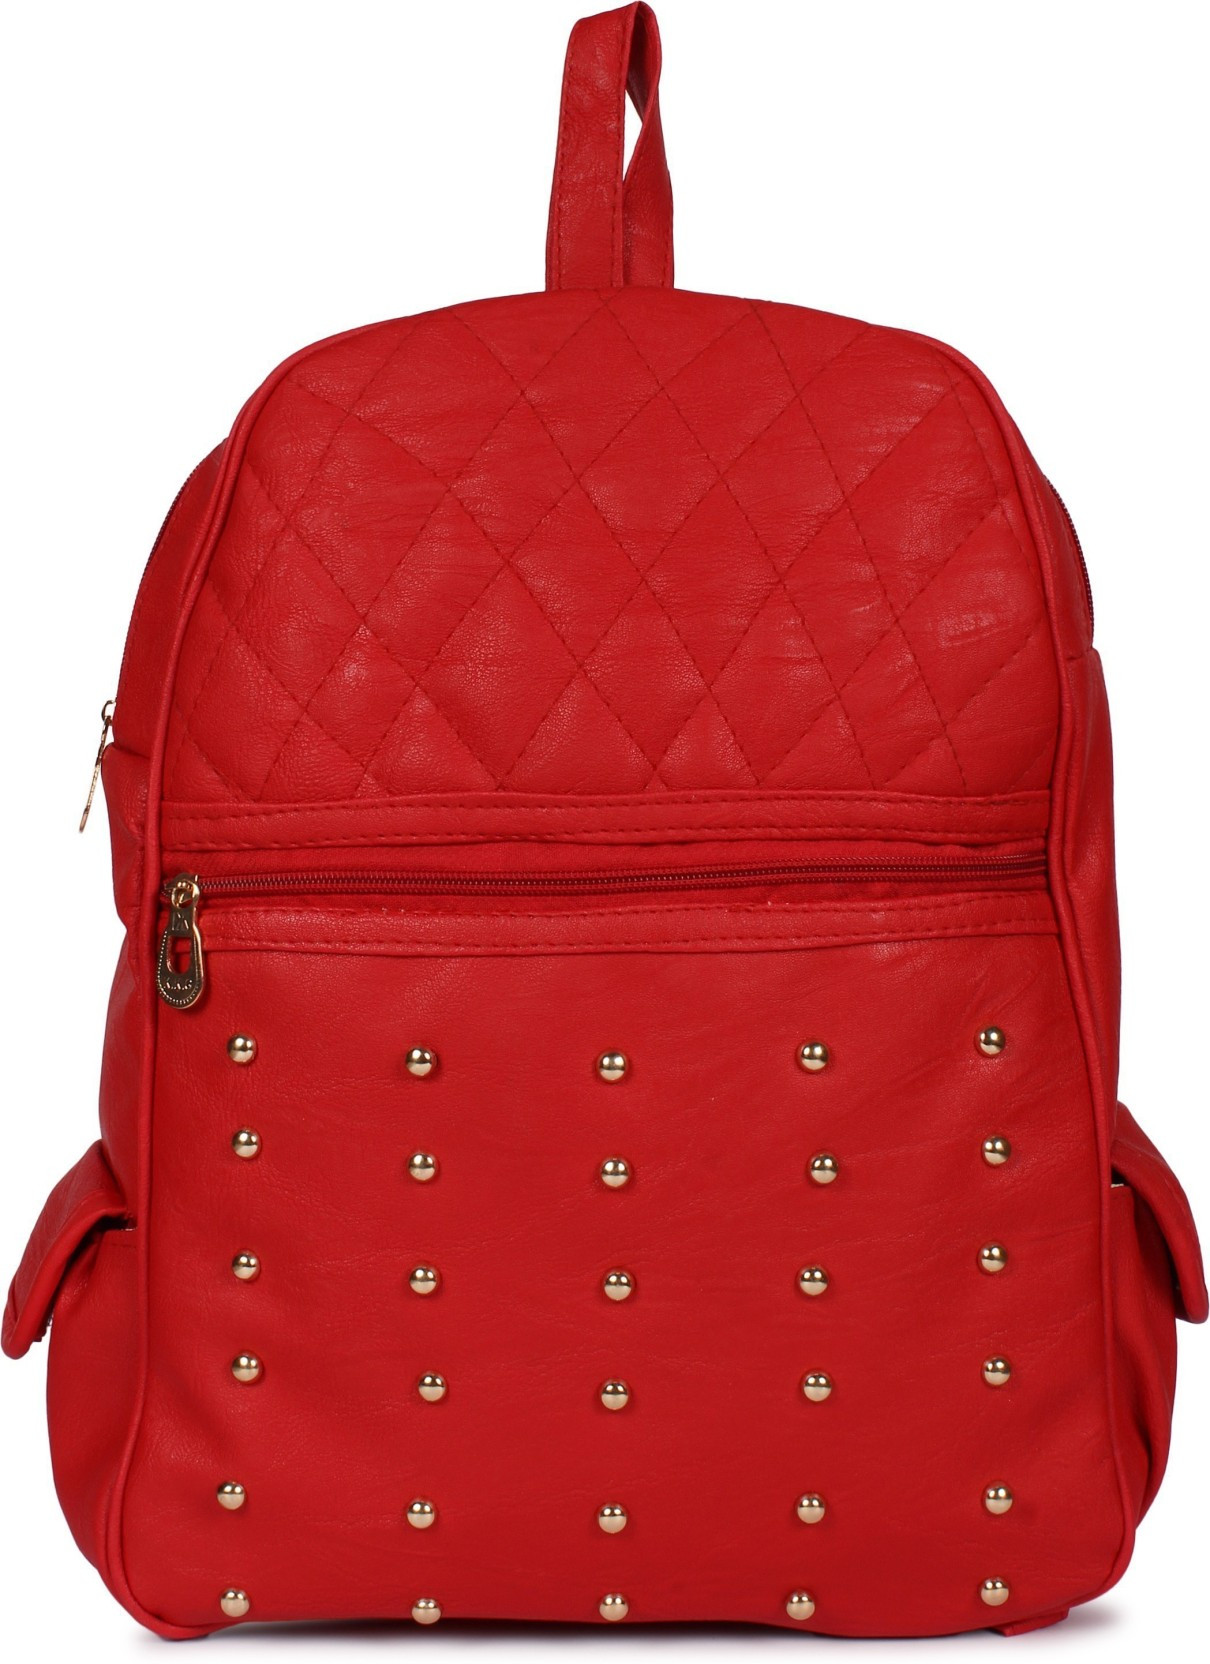 a8d61e4c7b1f Rajni Fashion PU Leather Girls Backpack